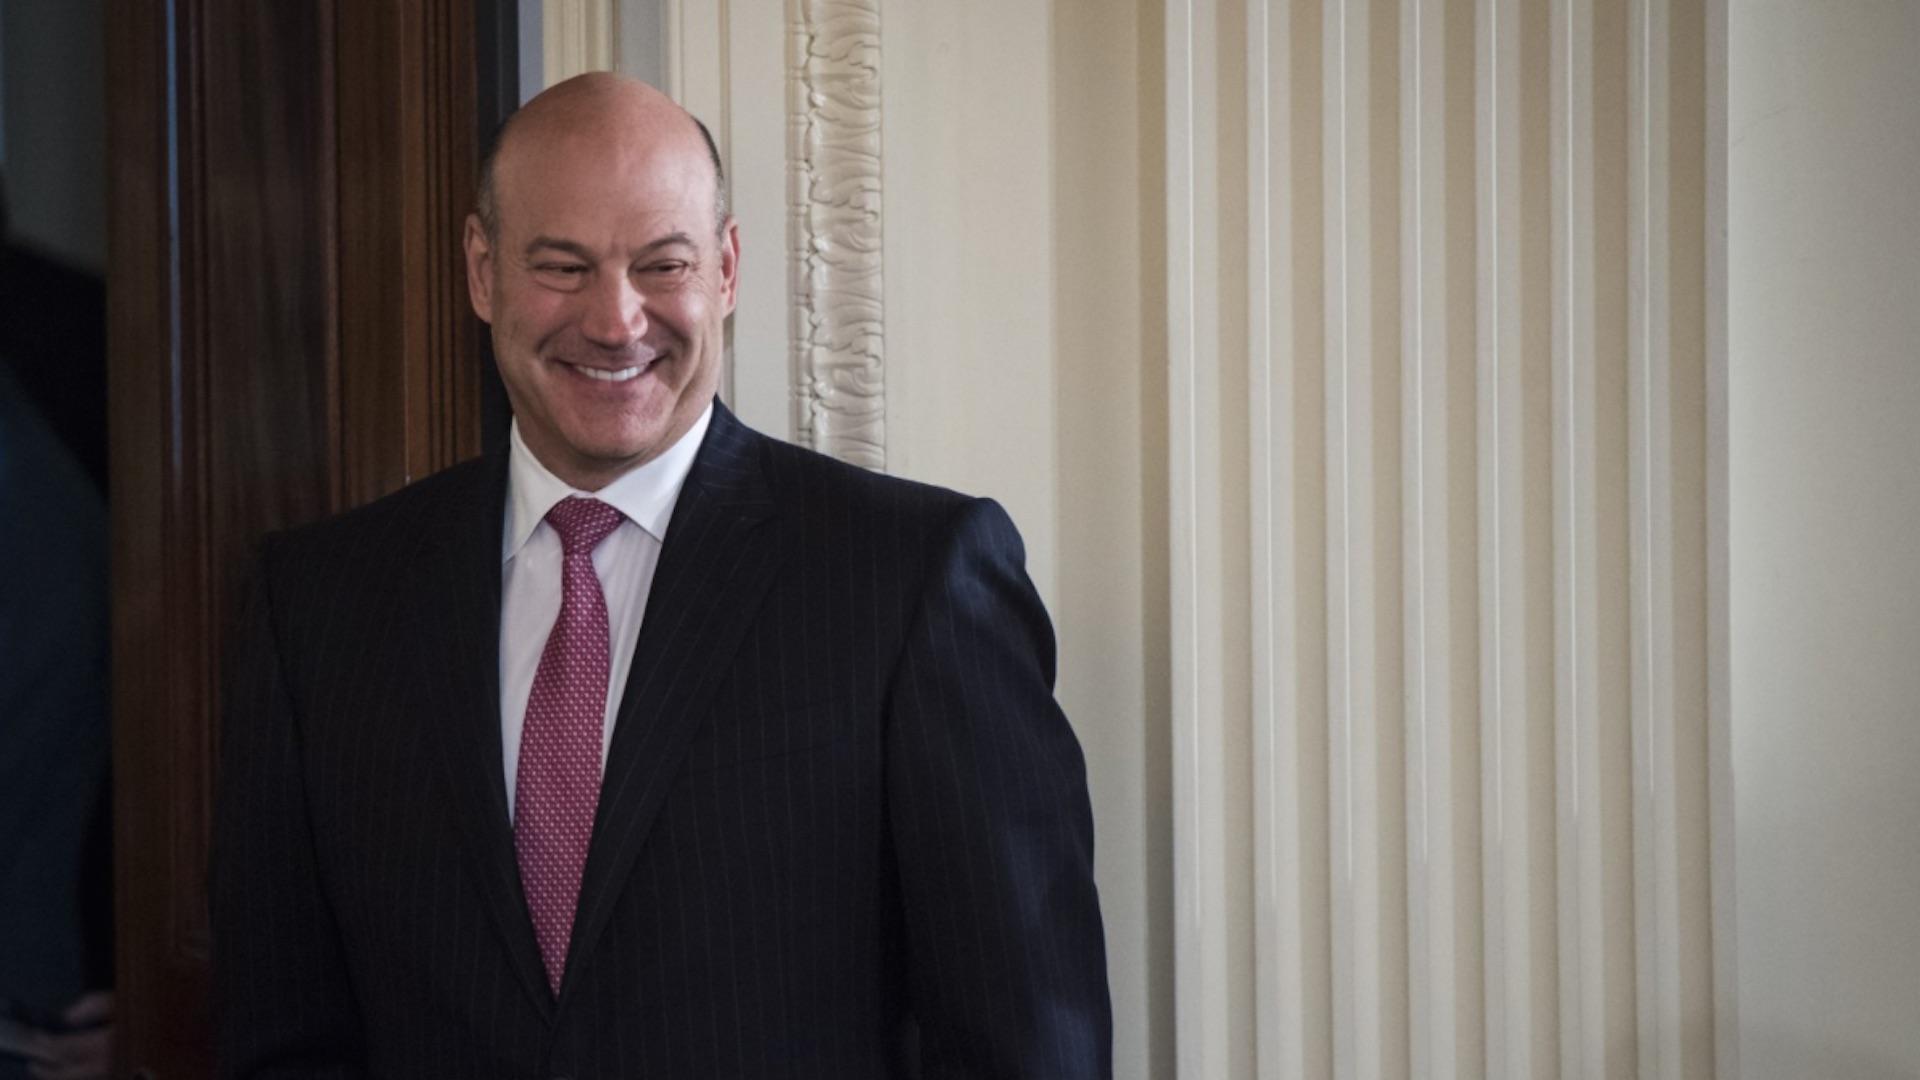 The eternal mystique of Goldman Sachs